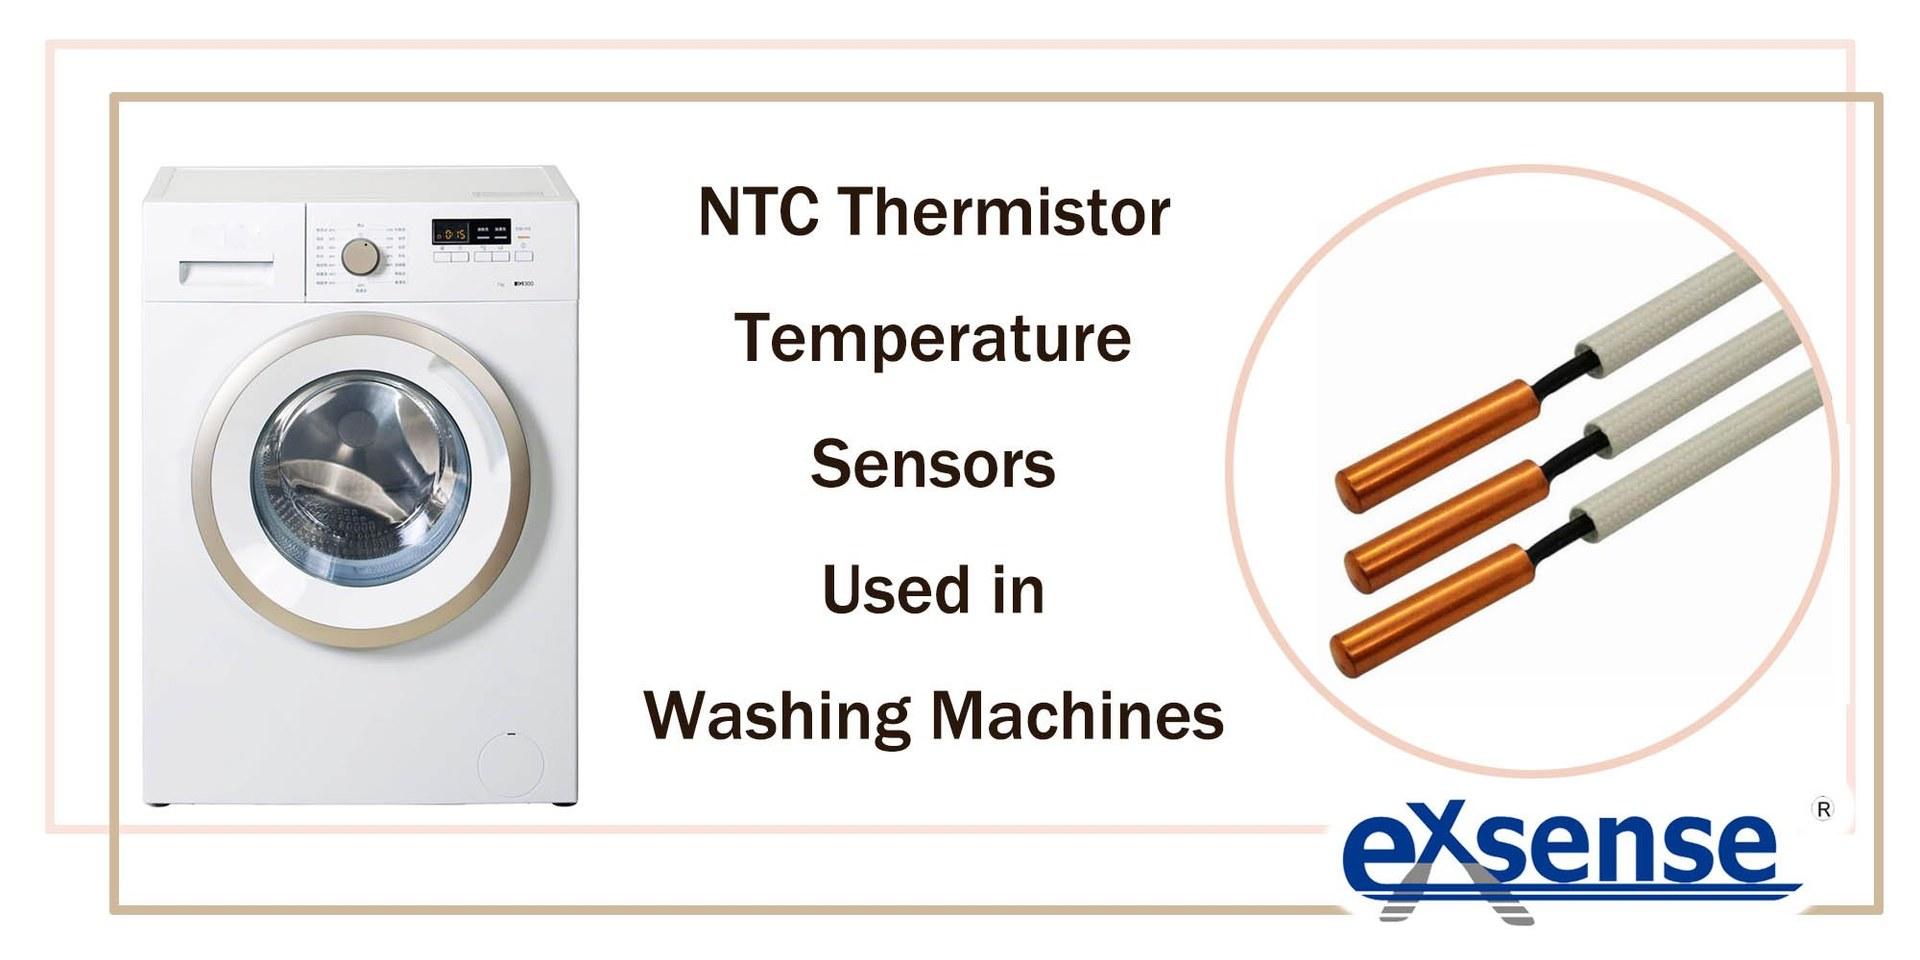 NTC Thermistor Temperature Sensor